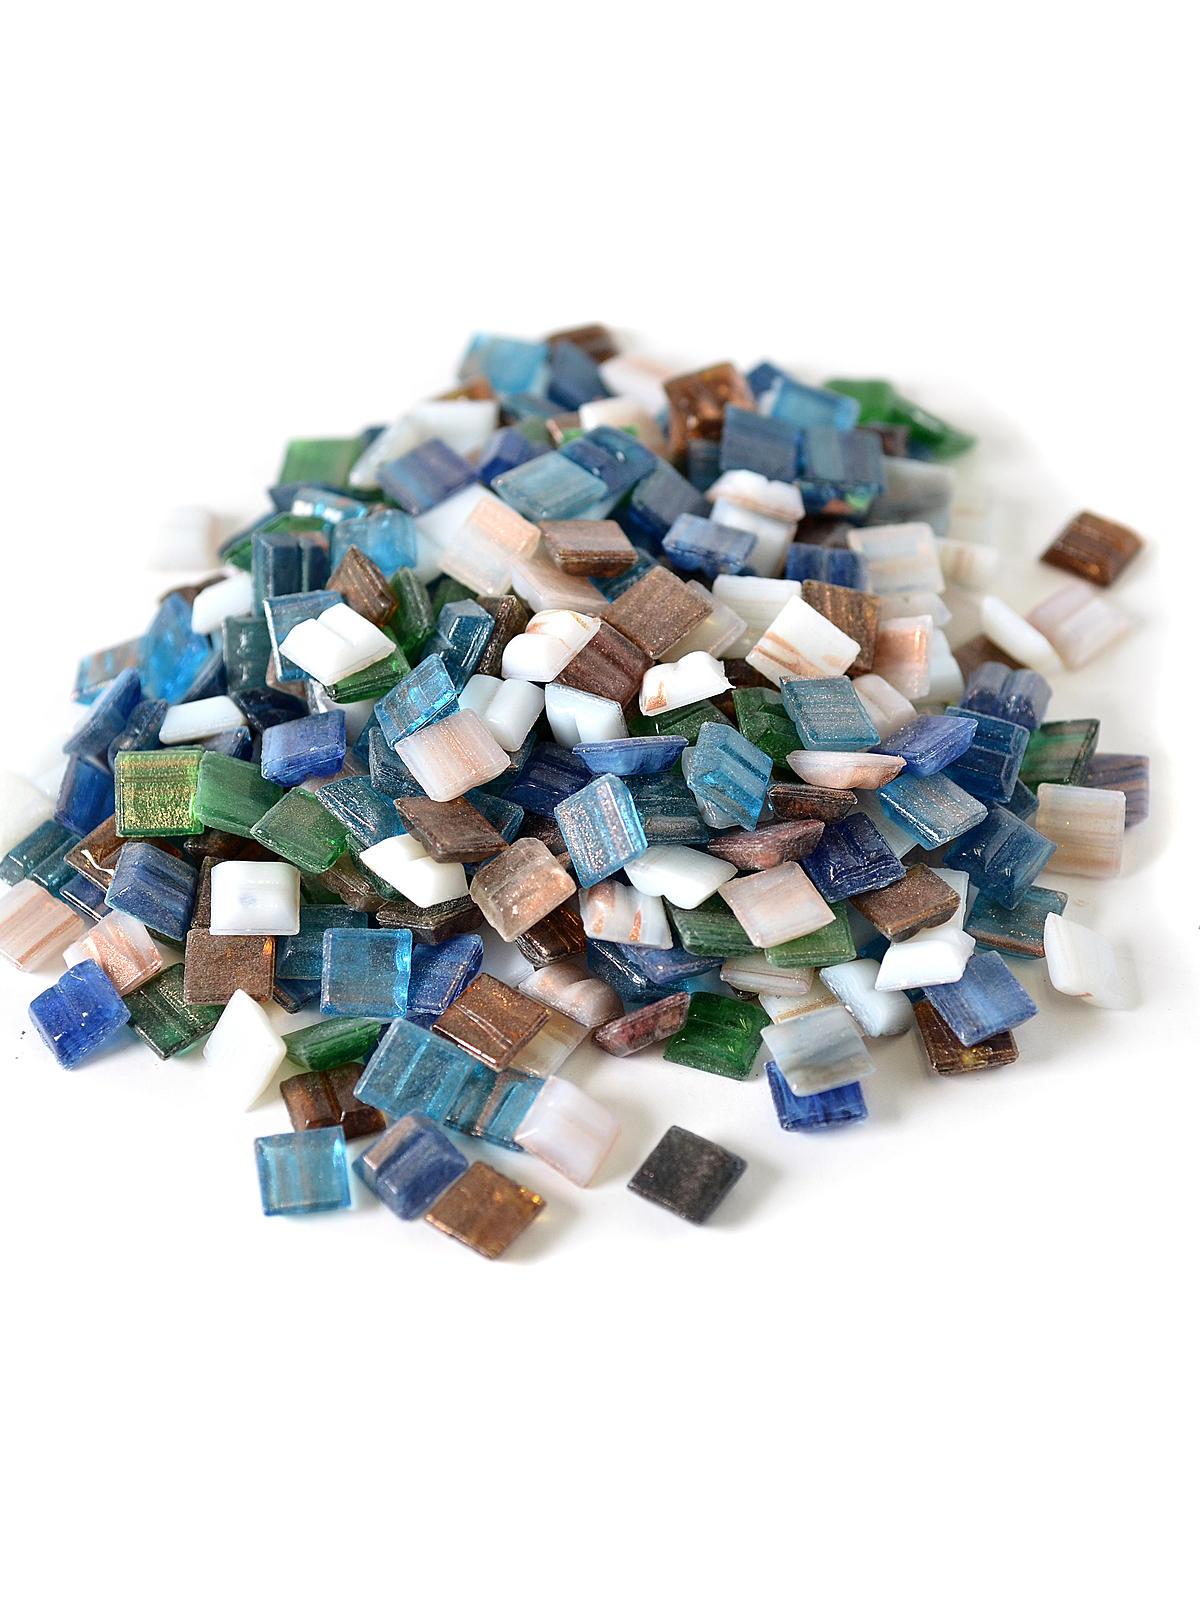 Mosaic Mercantile - Vitreous Glass Mosaic Tiles -- Metallic Colors